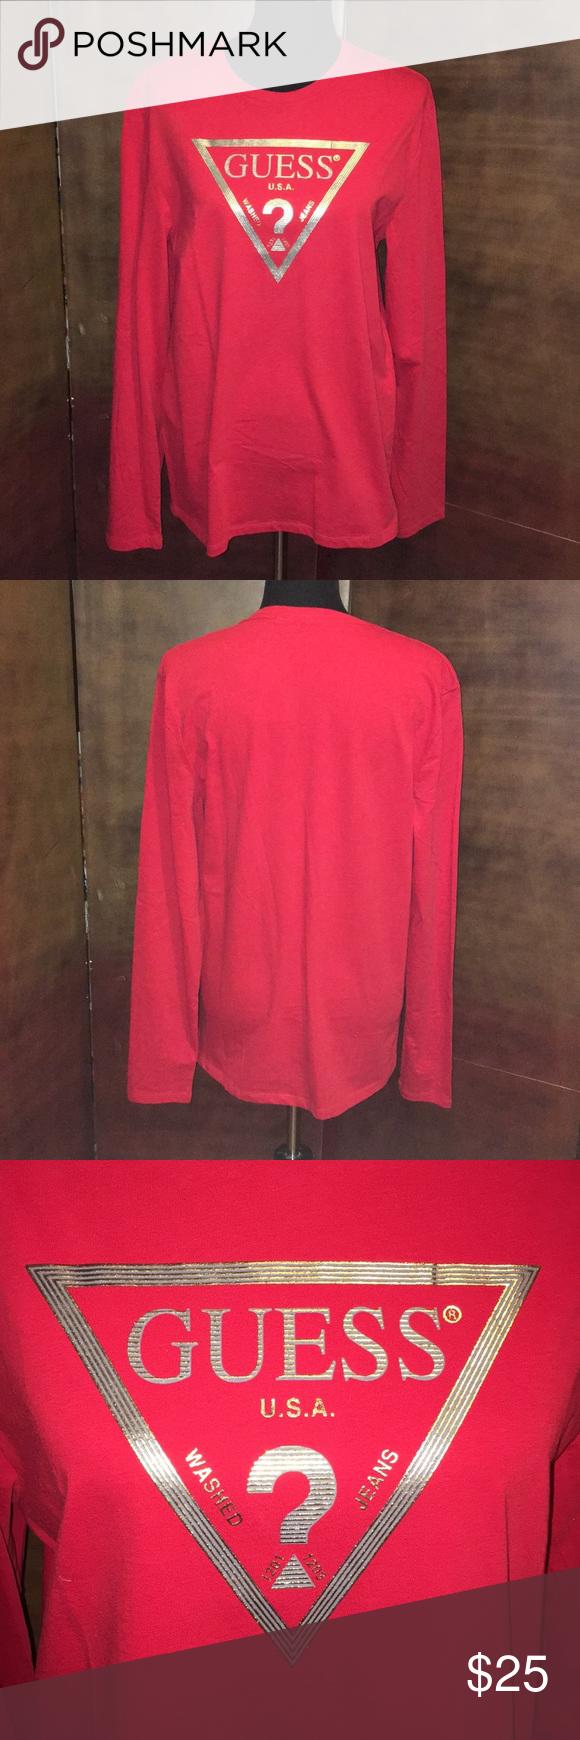 Nwt Guess Red Gold Long Sleeve Shirt Guess Shirts Clothes Design Long Sleeve Shirts